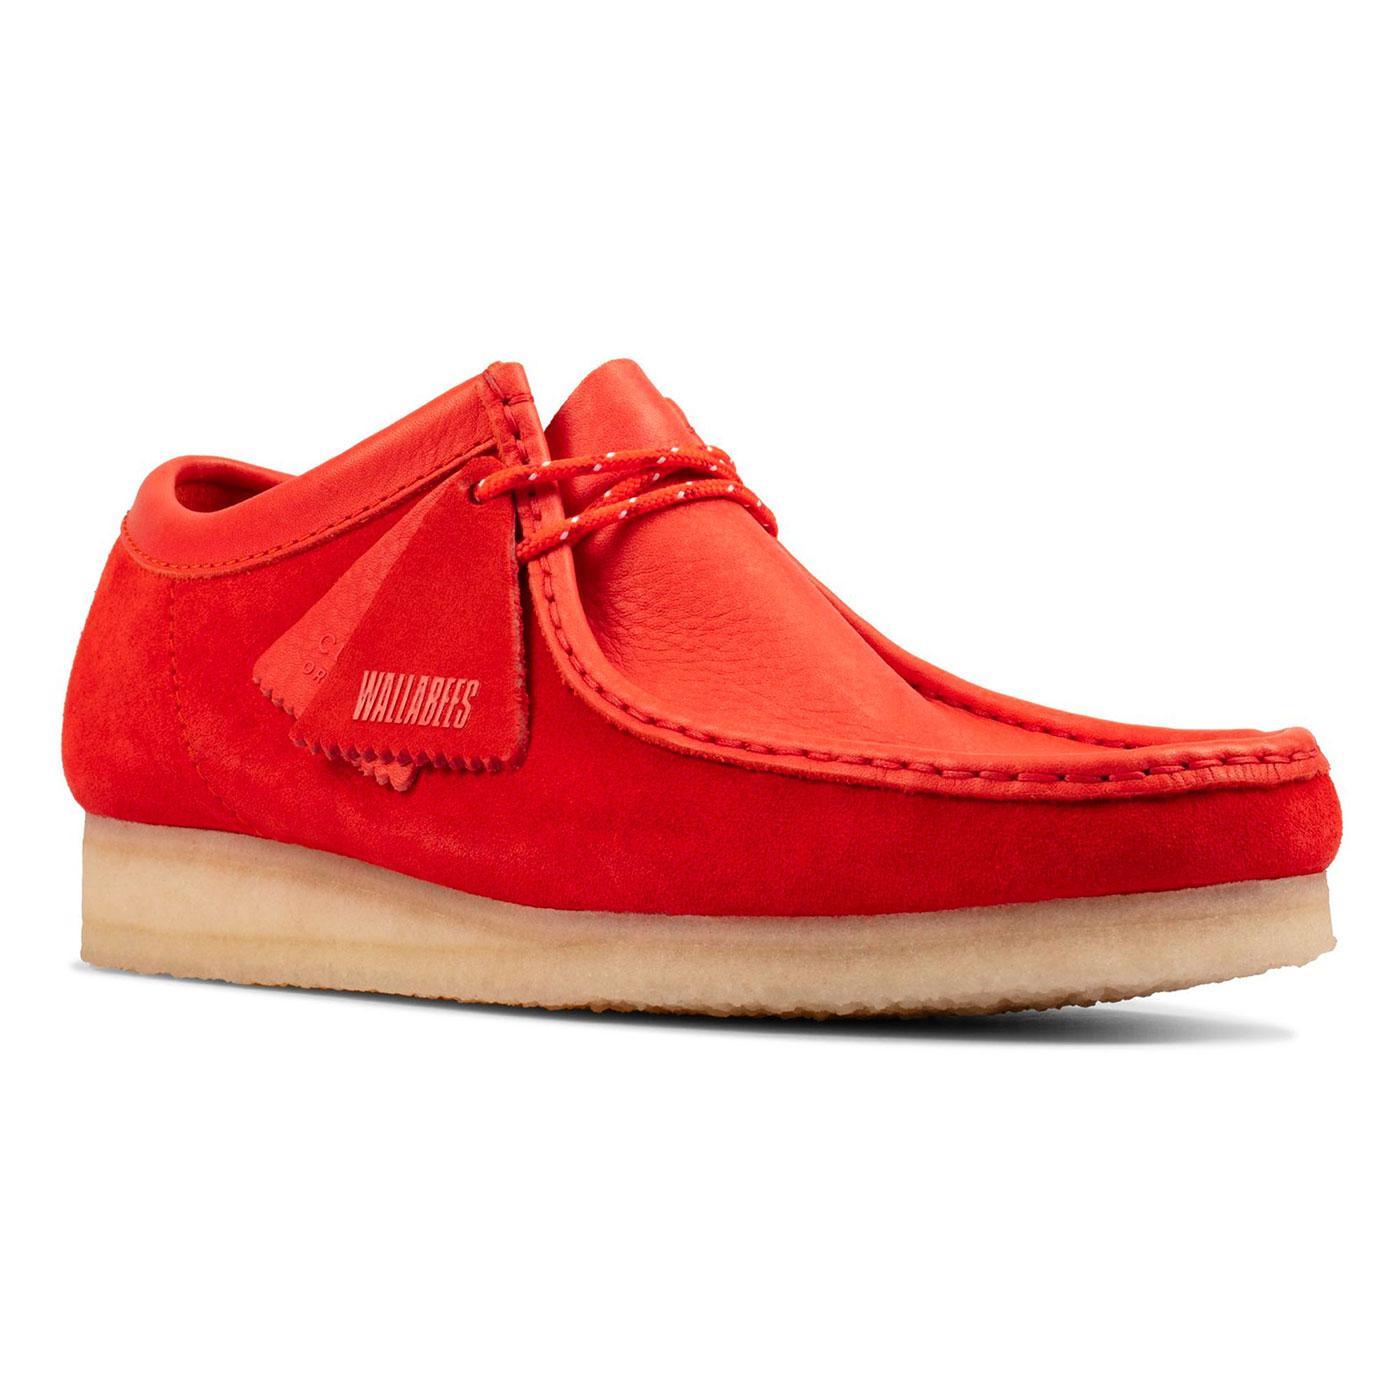 Wallabee CLARKS ORIGINALS Women's Suede Shoes (RC)